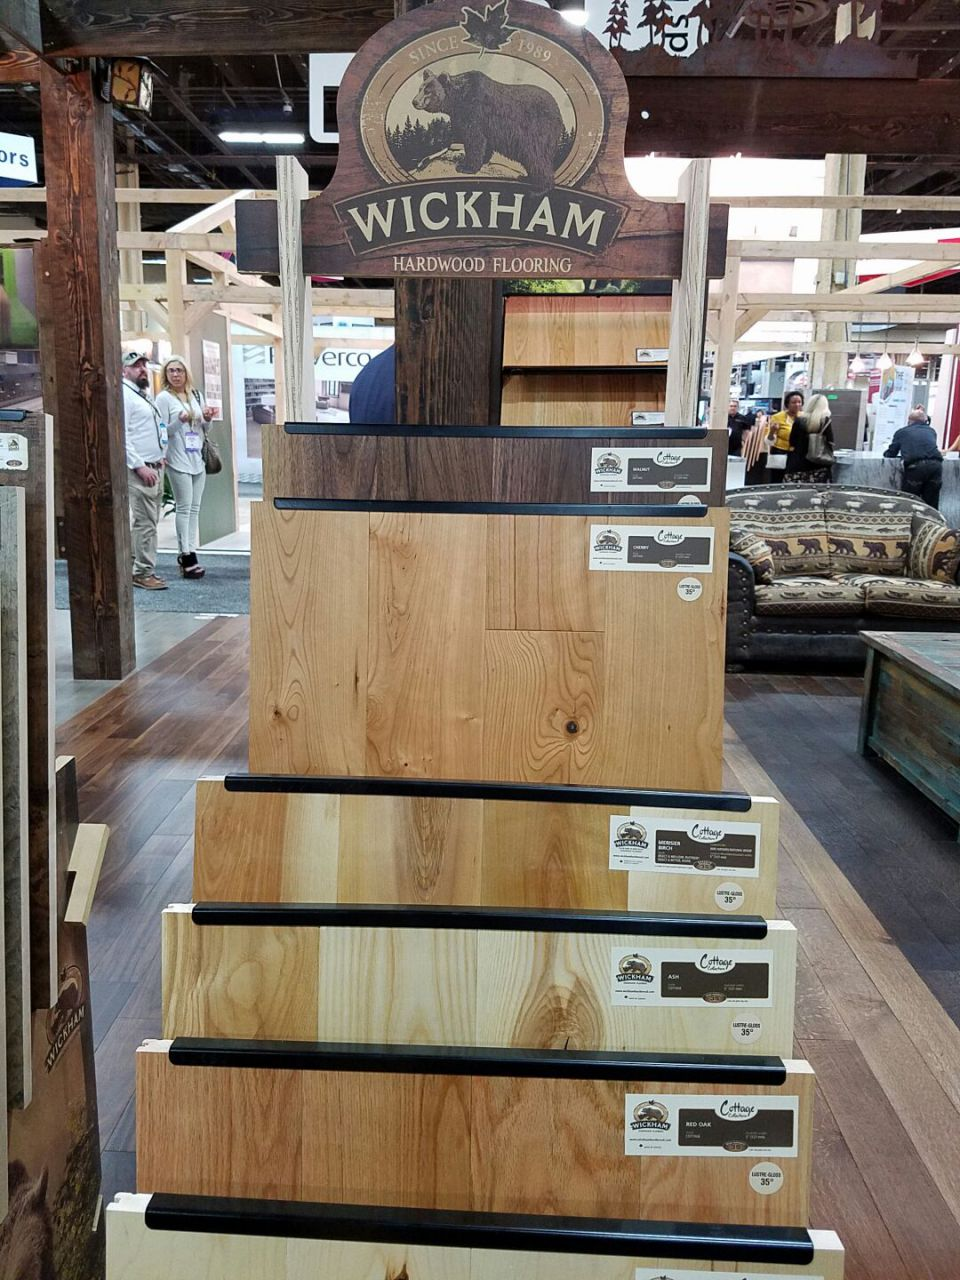 Wickham Floors Nyc Wickham Flooring New York Wickham